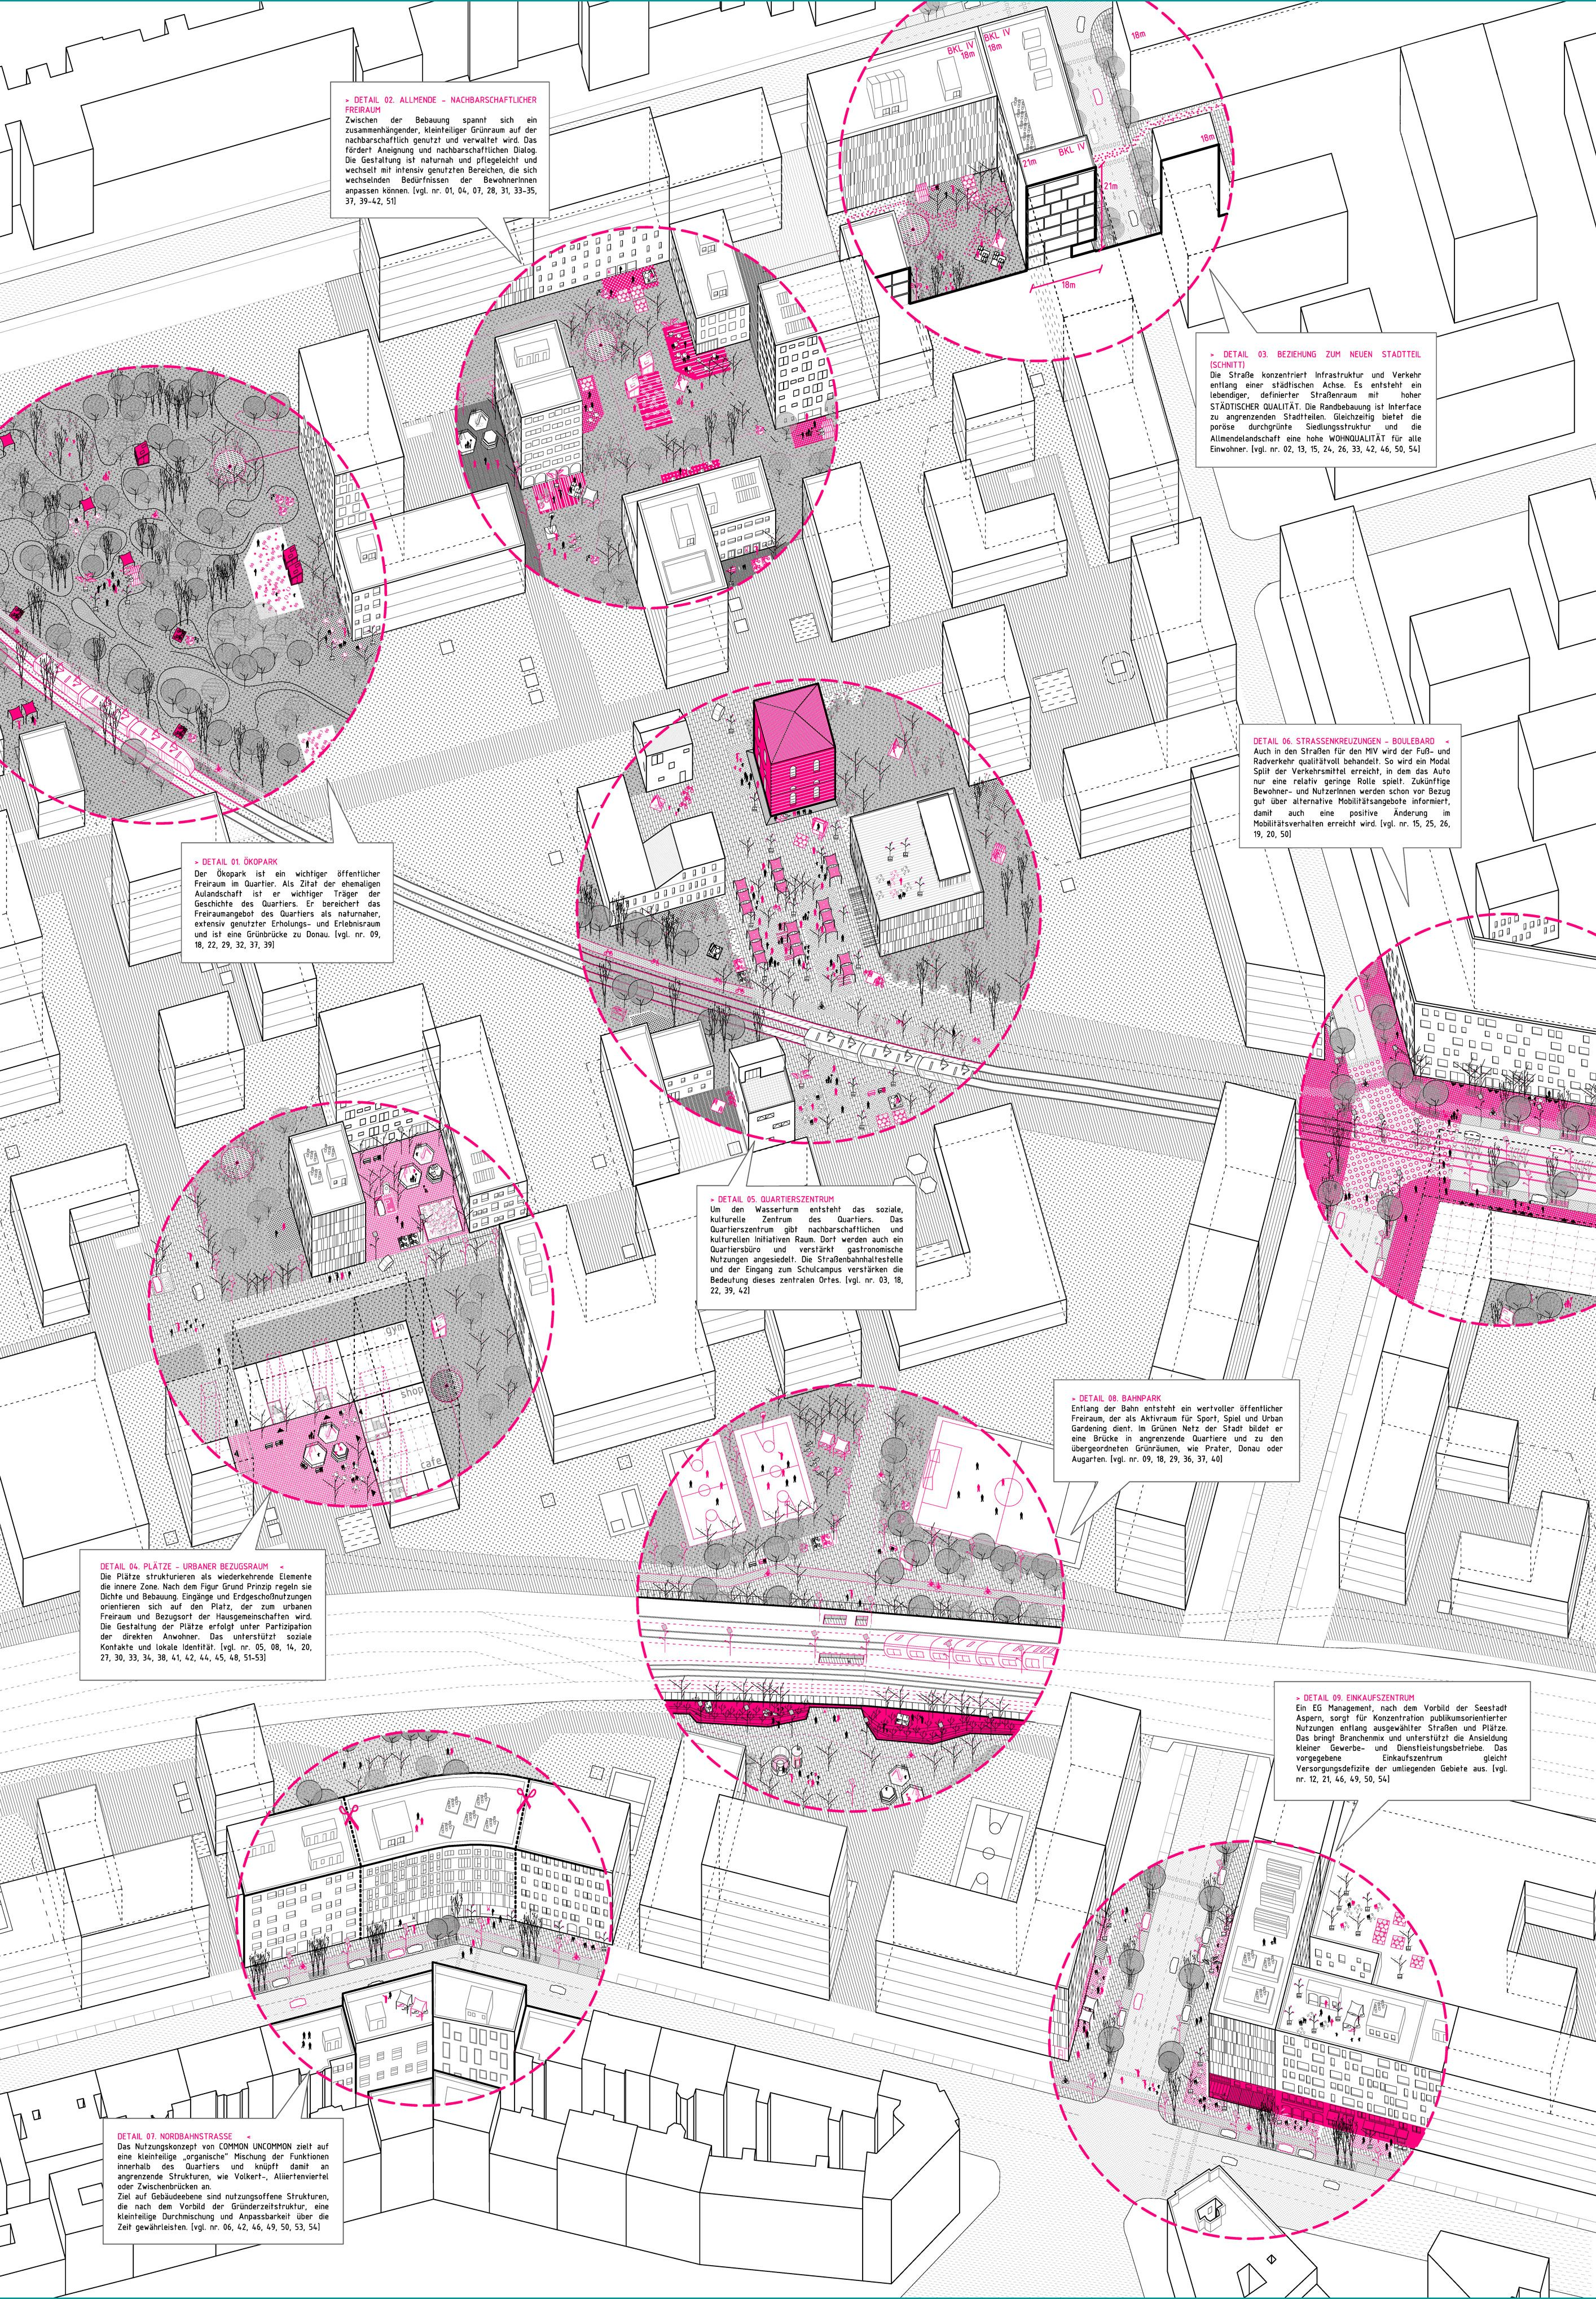 Pin by Adriana Chavez on laminas | Urban design diagram